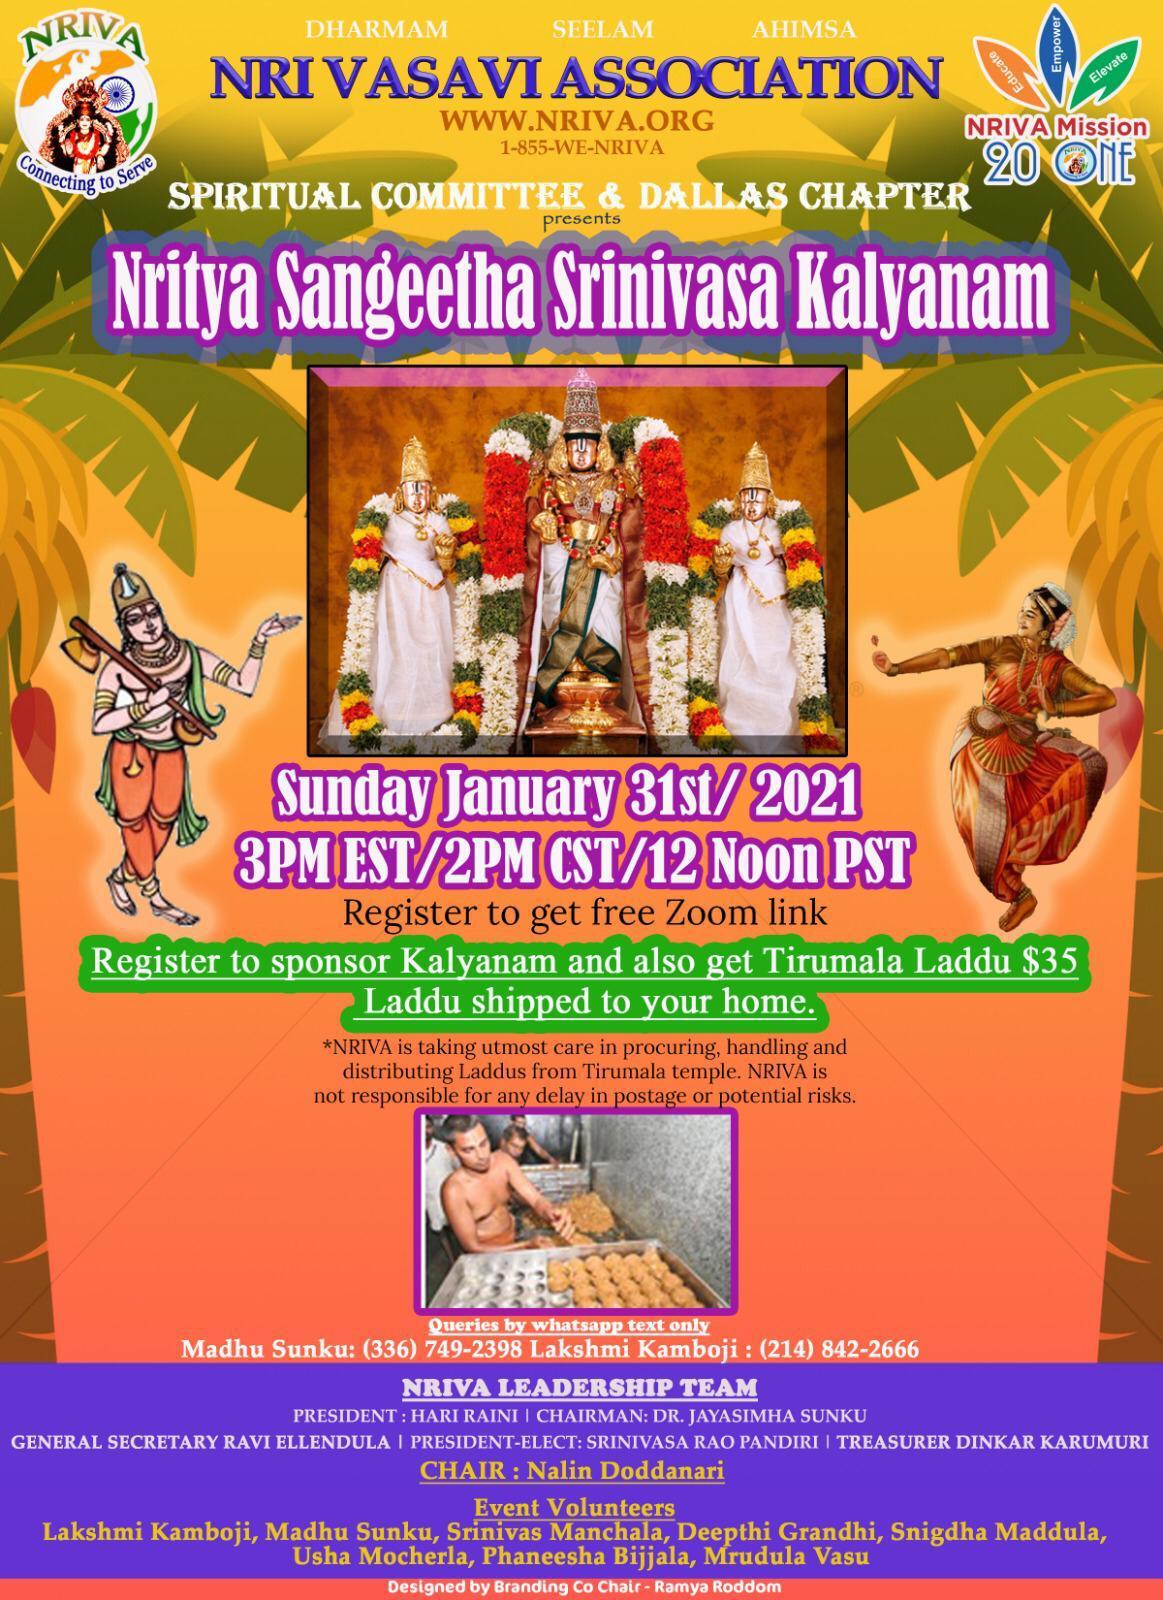 Nritya Sangeetha Srinivasa Kalyanam